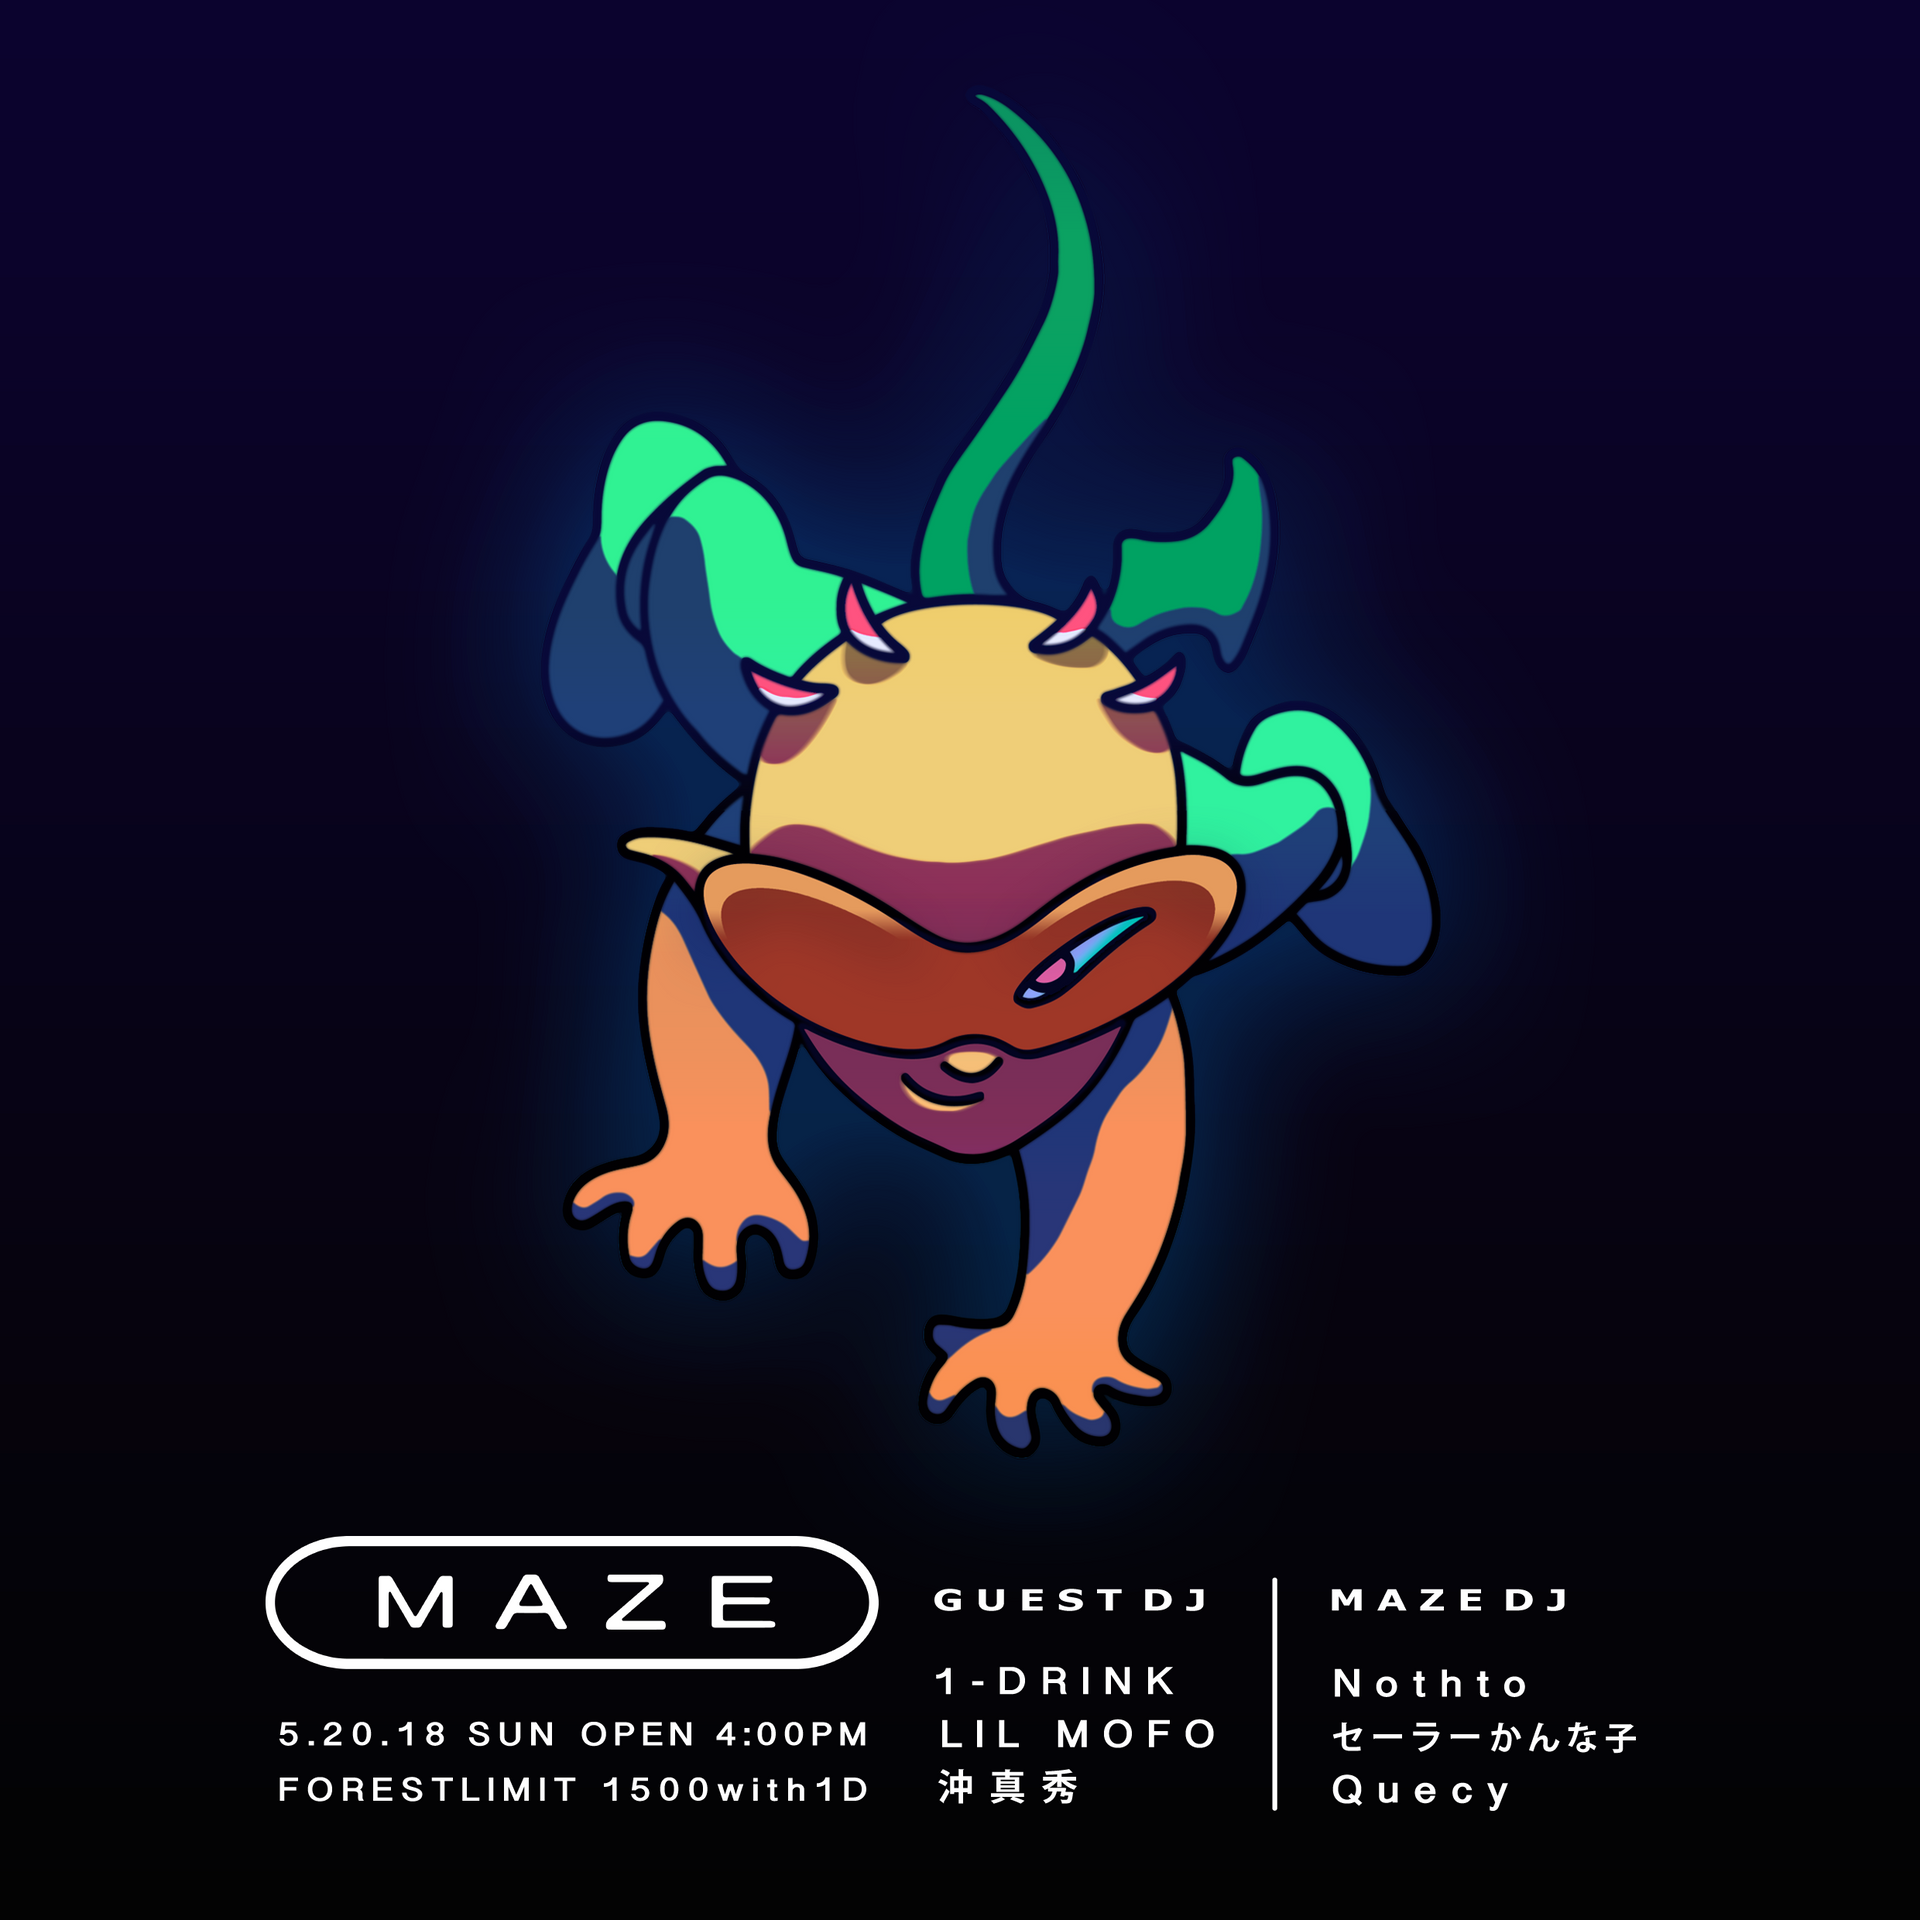 kz_maze_square_fix.png